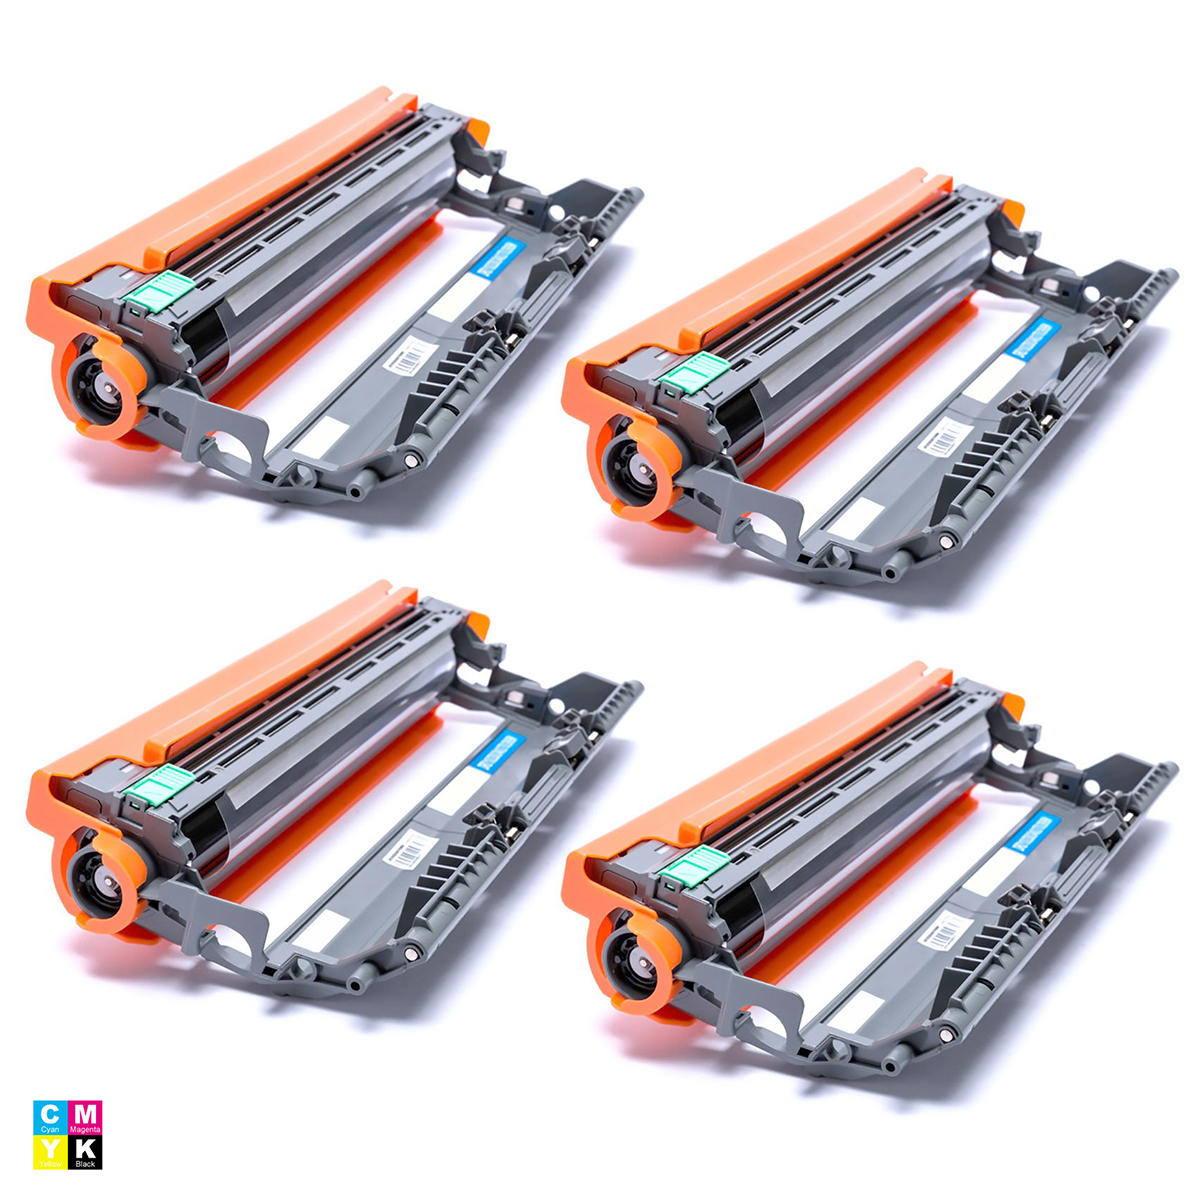 Compatível: Kit 4x Fotocondutor DR210 para Brother HL-3040 3045 3070 8070 8370 MFC-9010 9125 9320 9325 / CMYK / 15.000